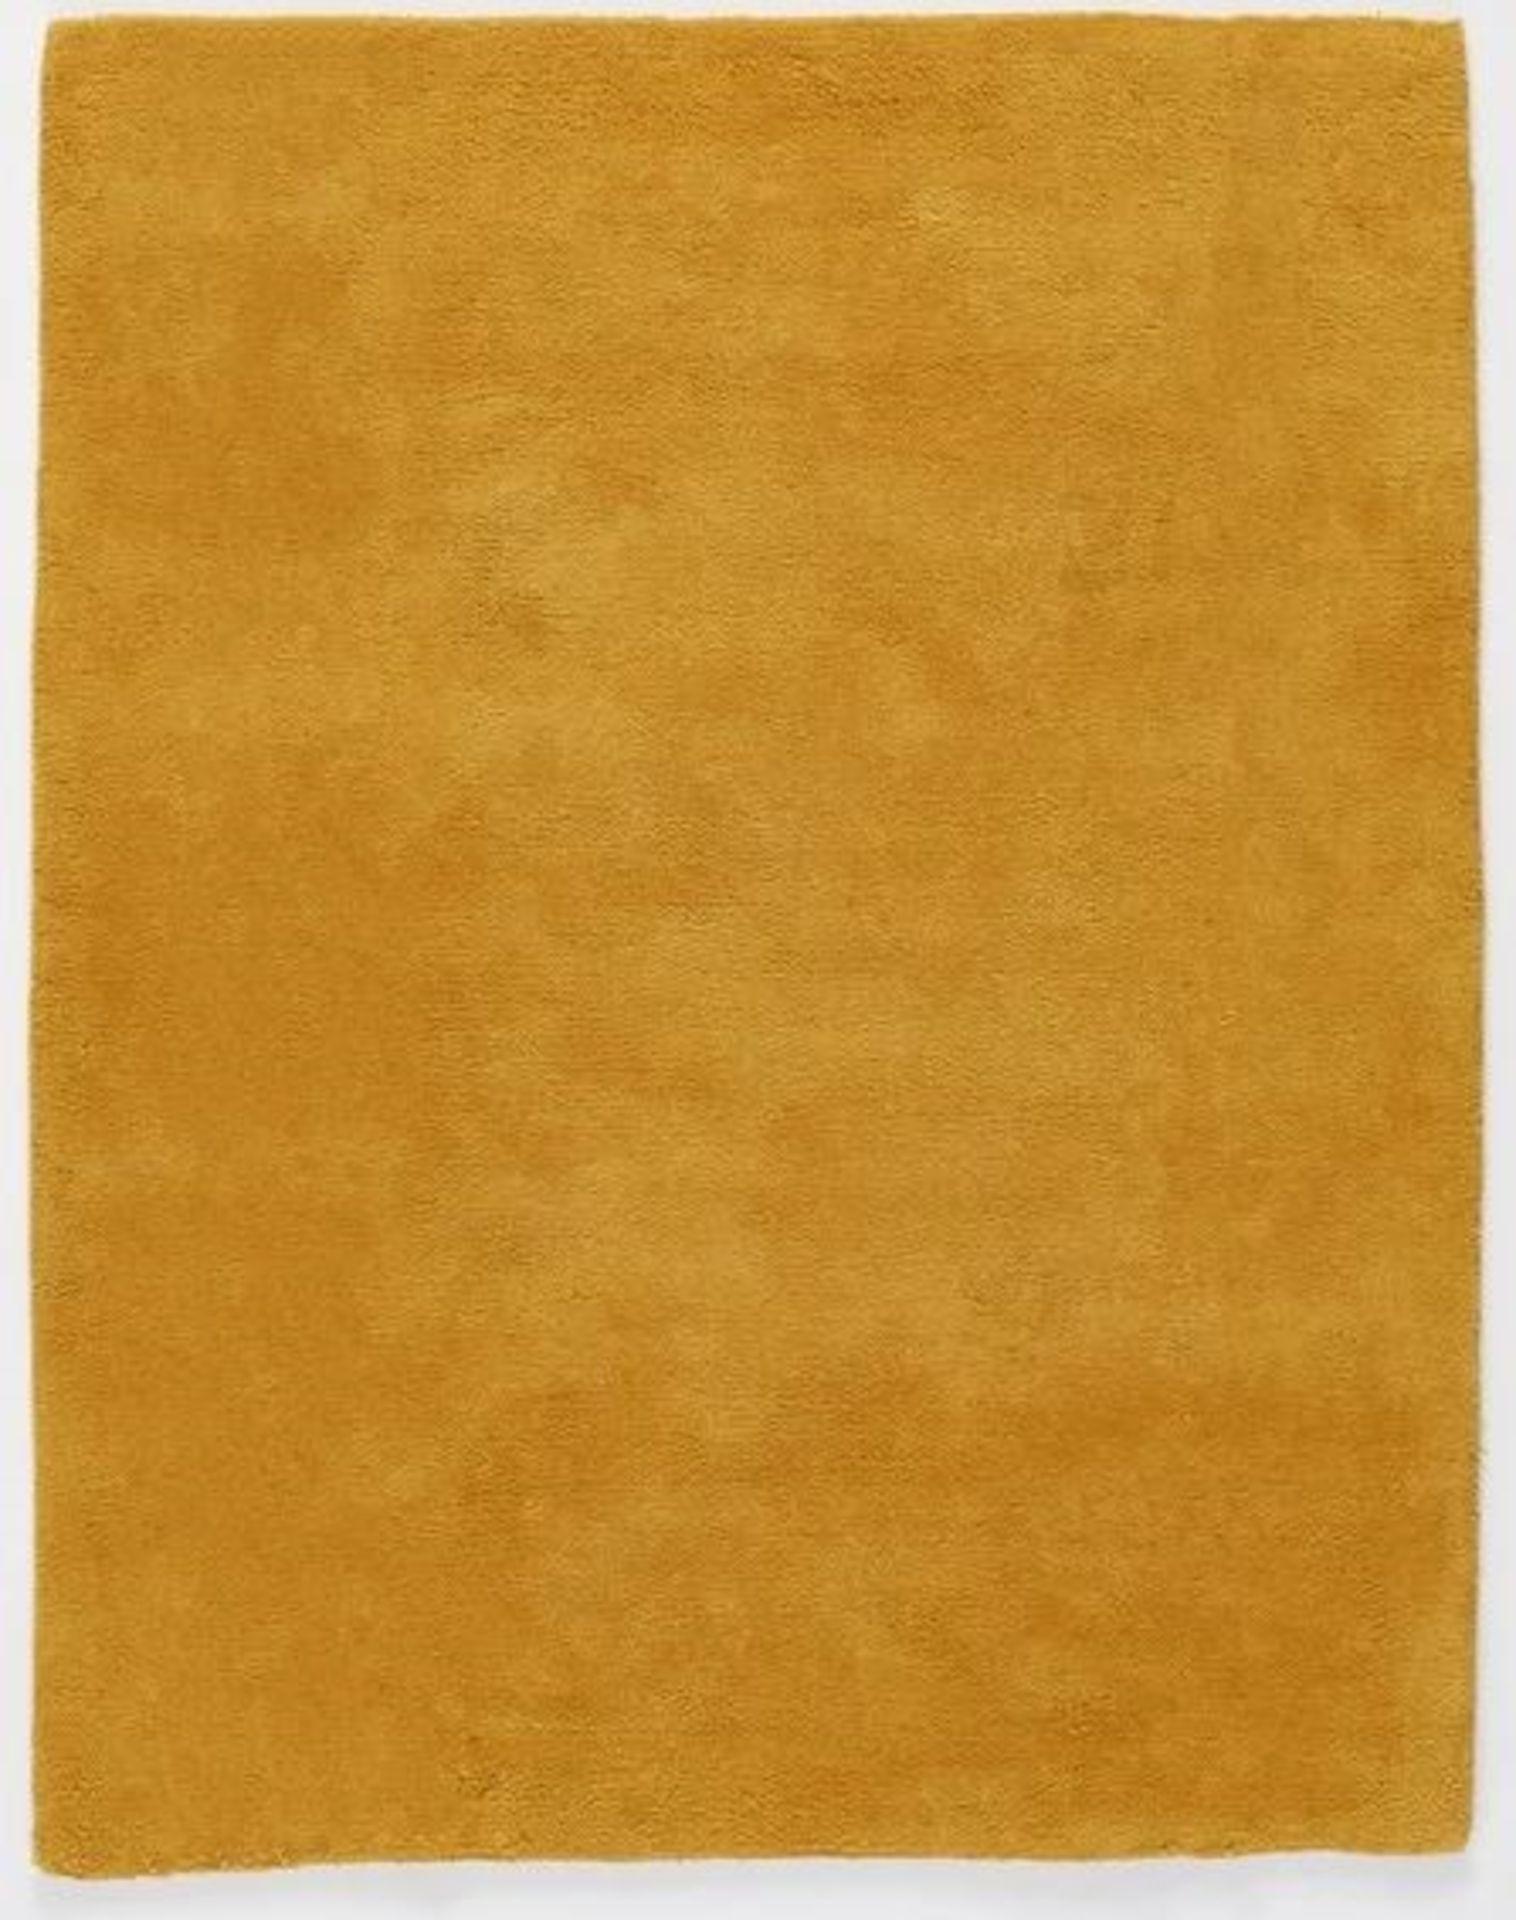 LA REDOUTE RENZO TUFTED COTTON RUG (170X230)